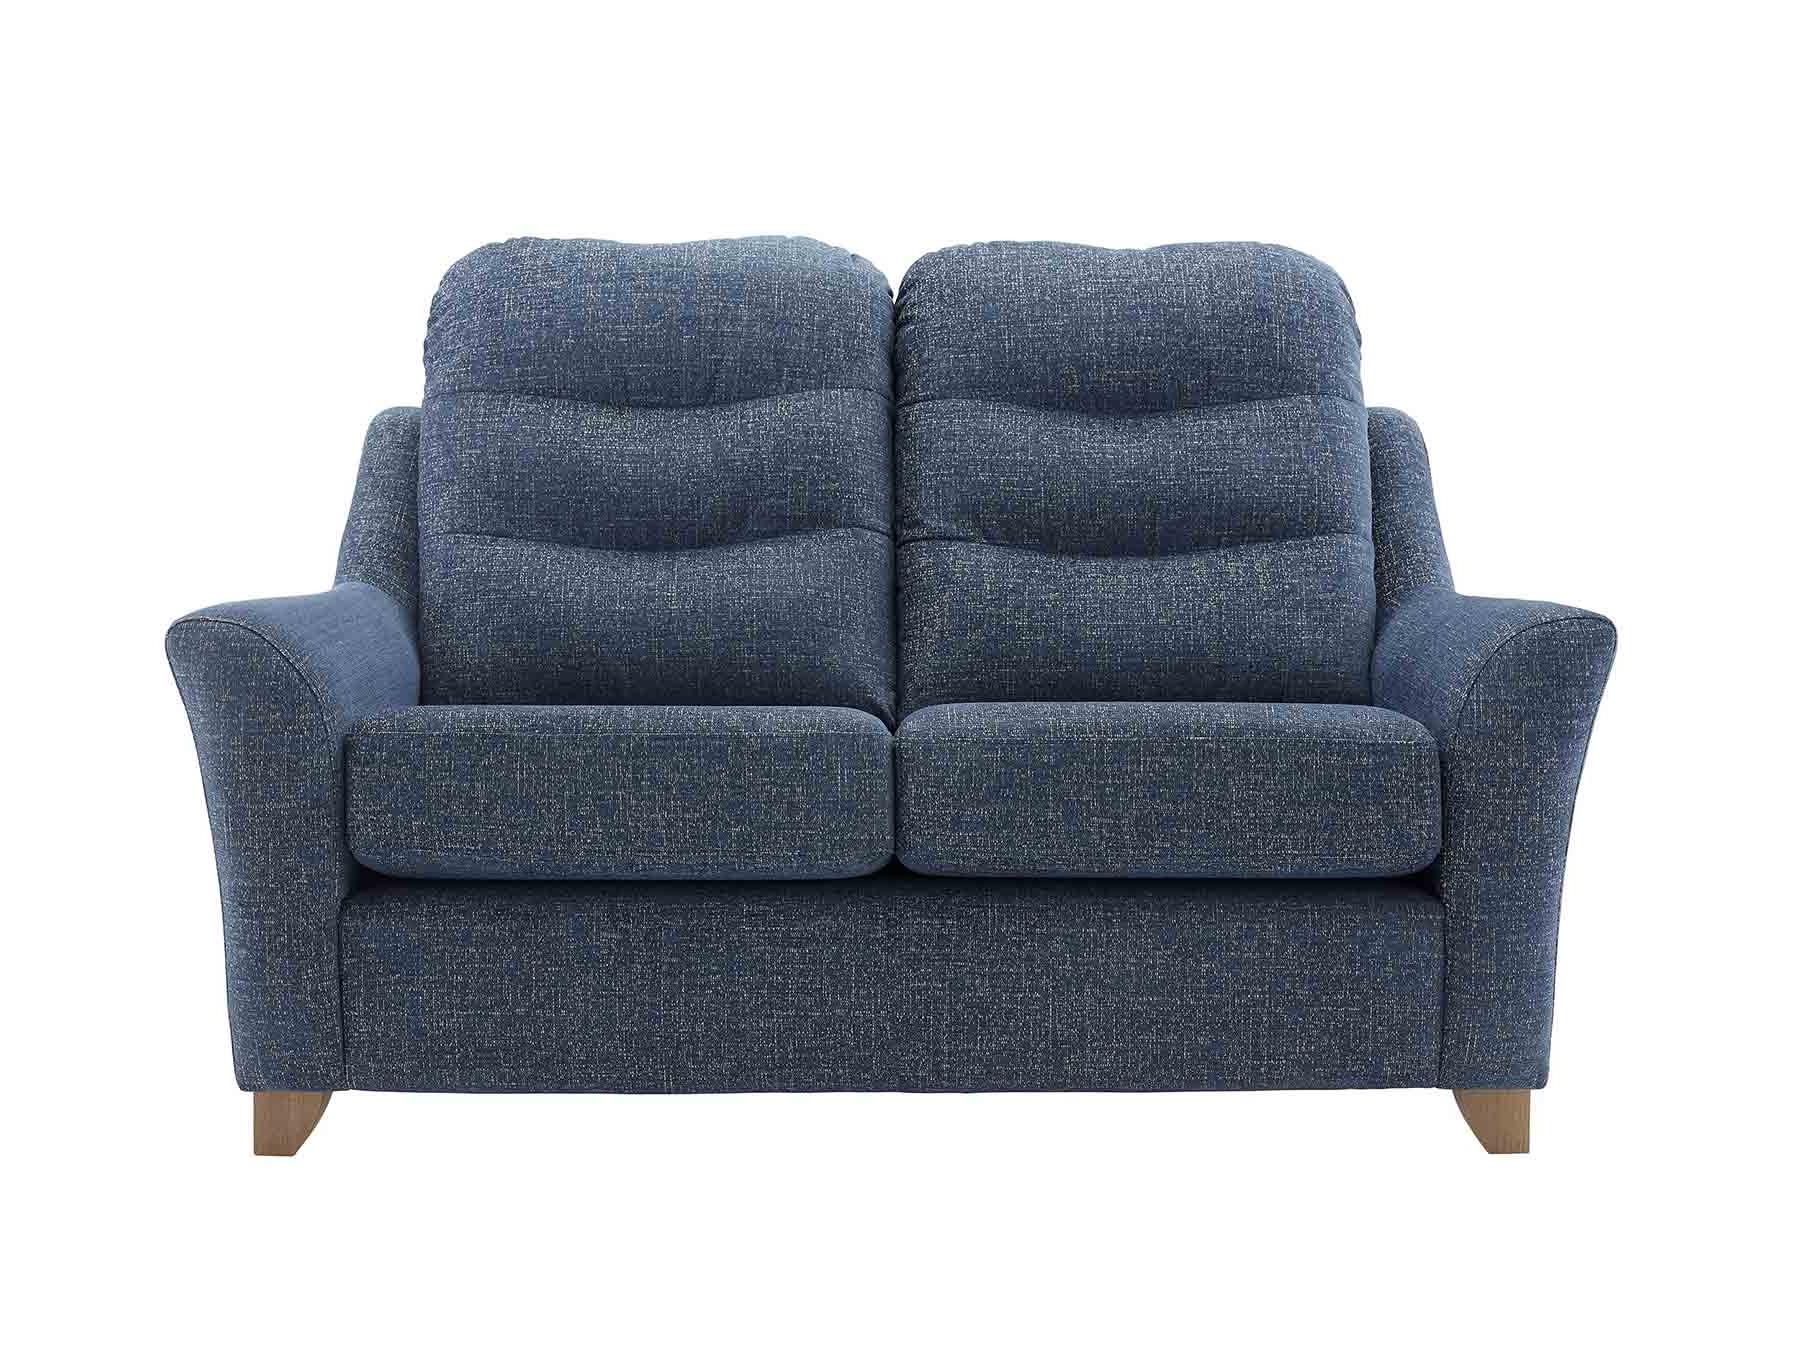 Featured Photo of Tate Ii Sofa Chairs